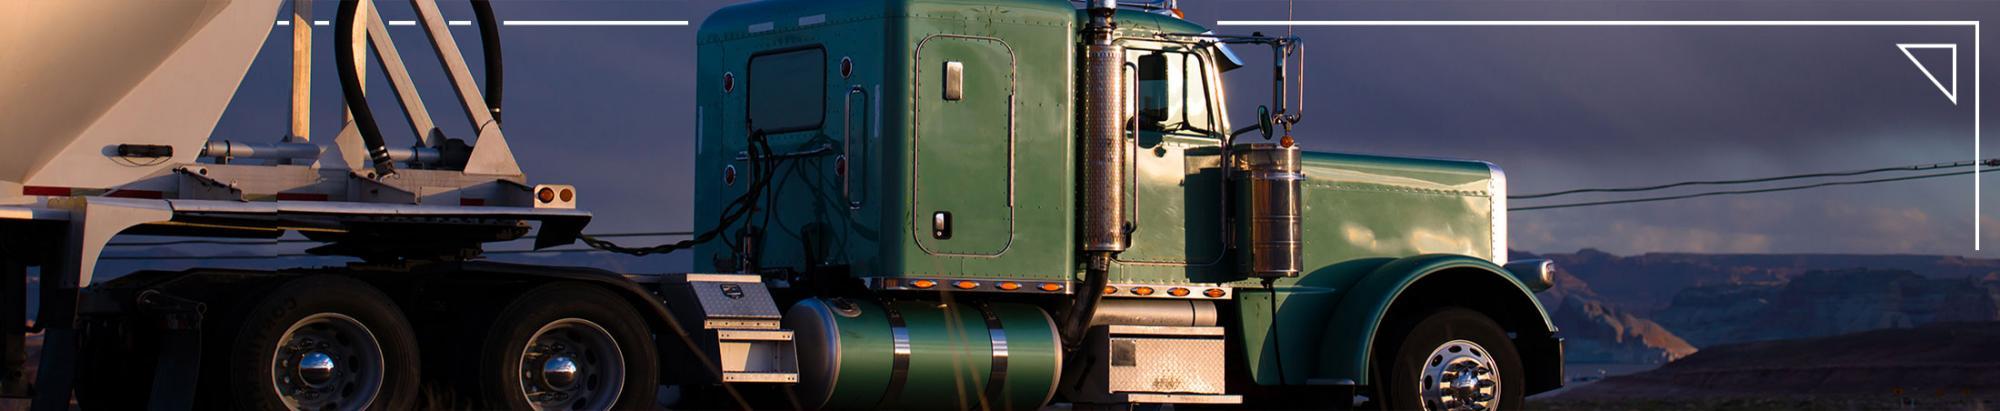 trucking in Arizona-Sonora border region